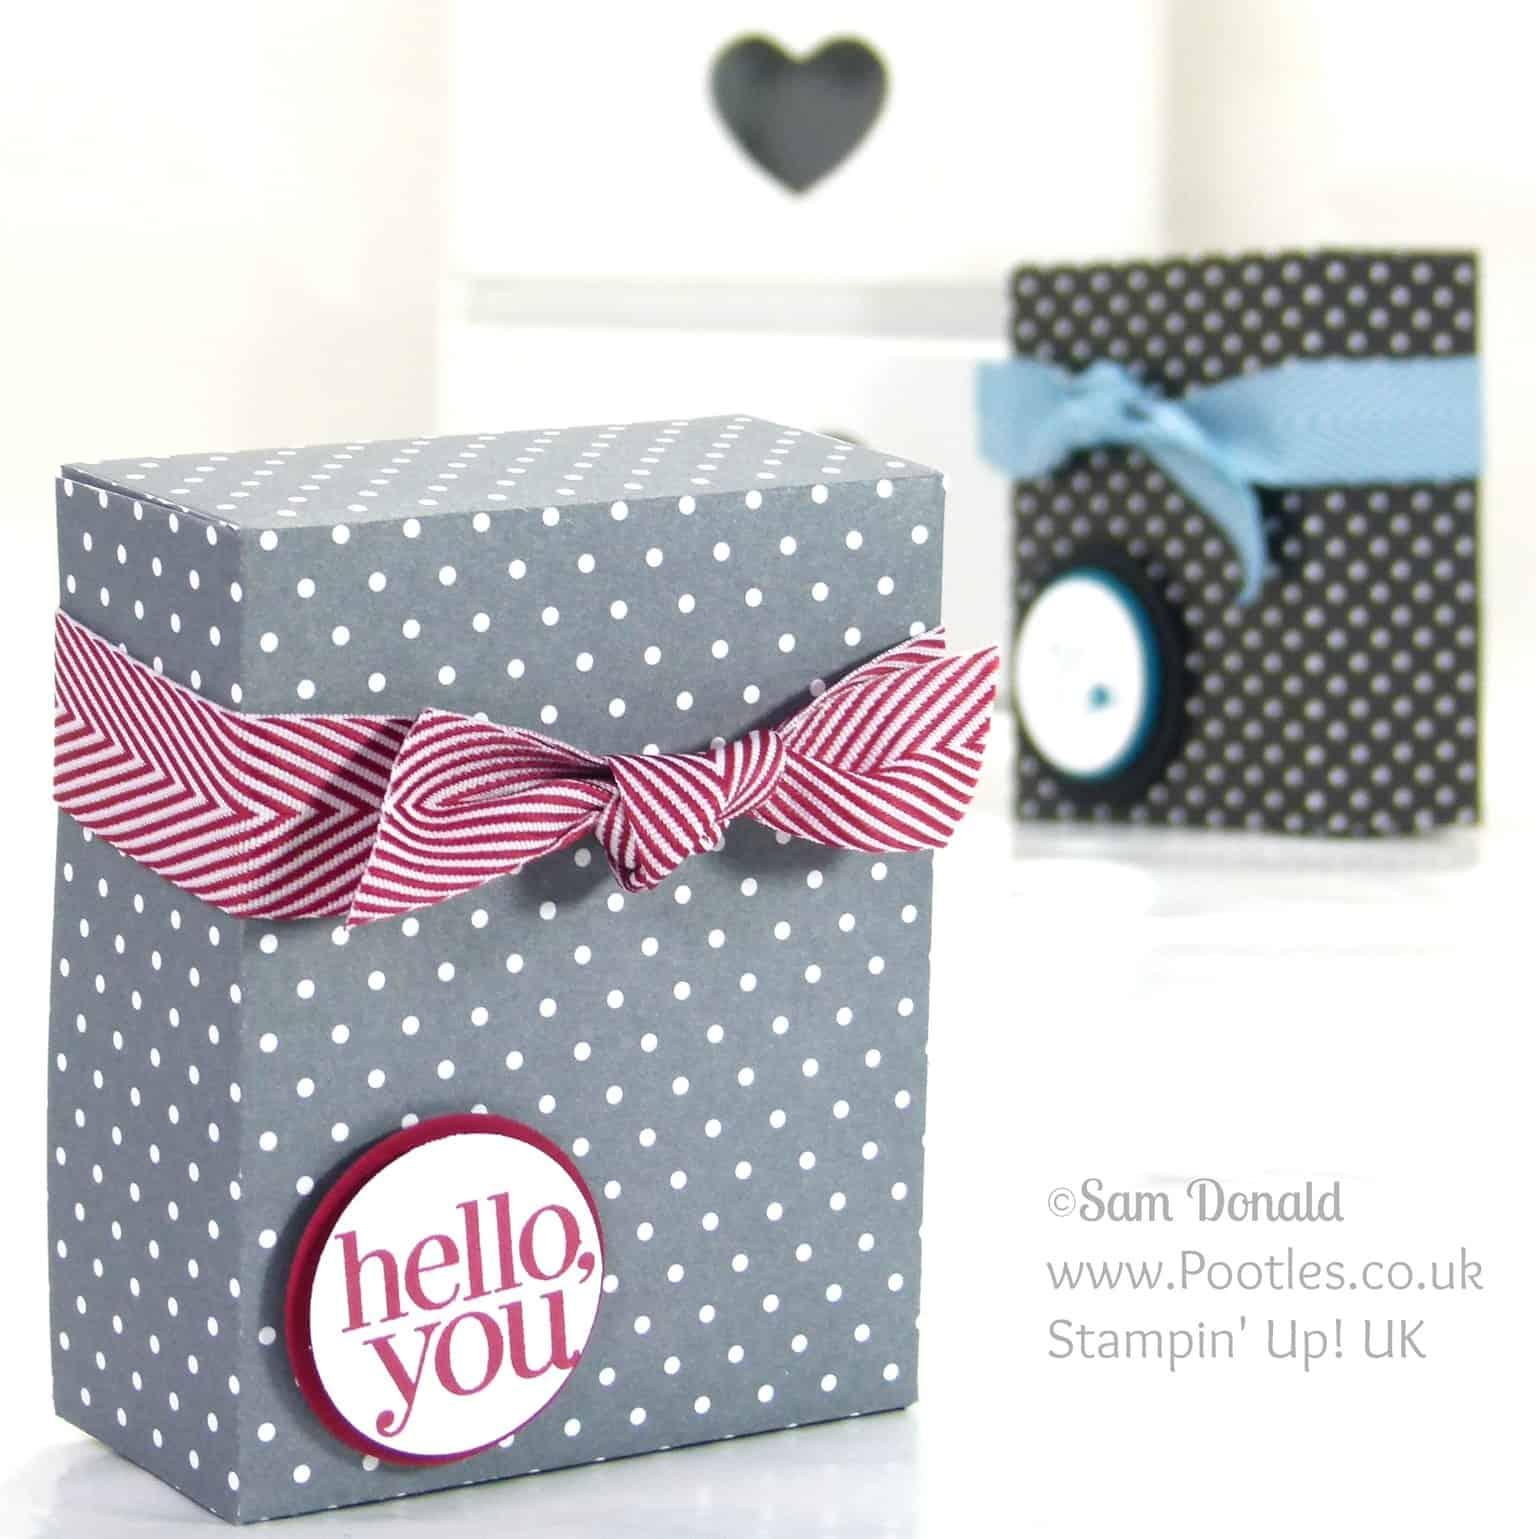 Stampin' Up! UK Independent Demonstrator Pootles. Paper Box Tutorial using Stampin' Up Designer Paper